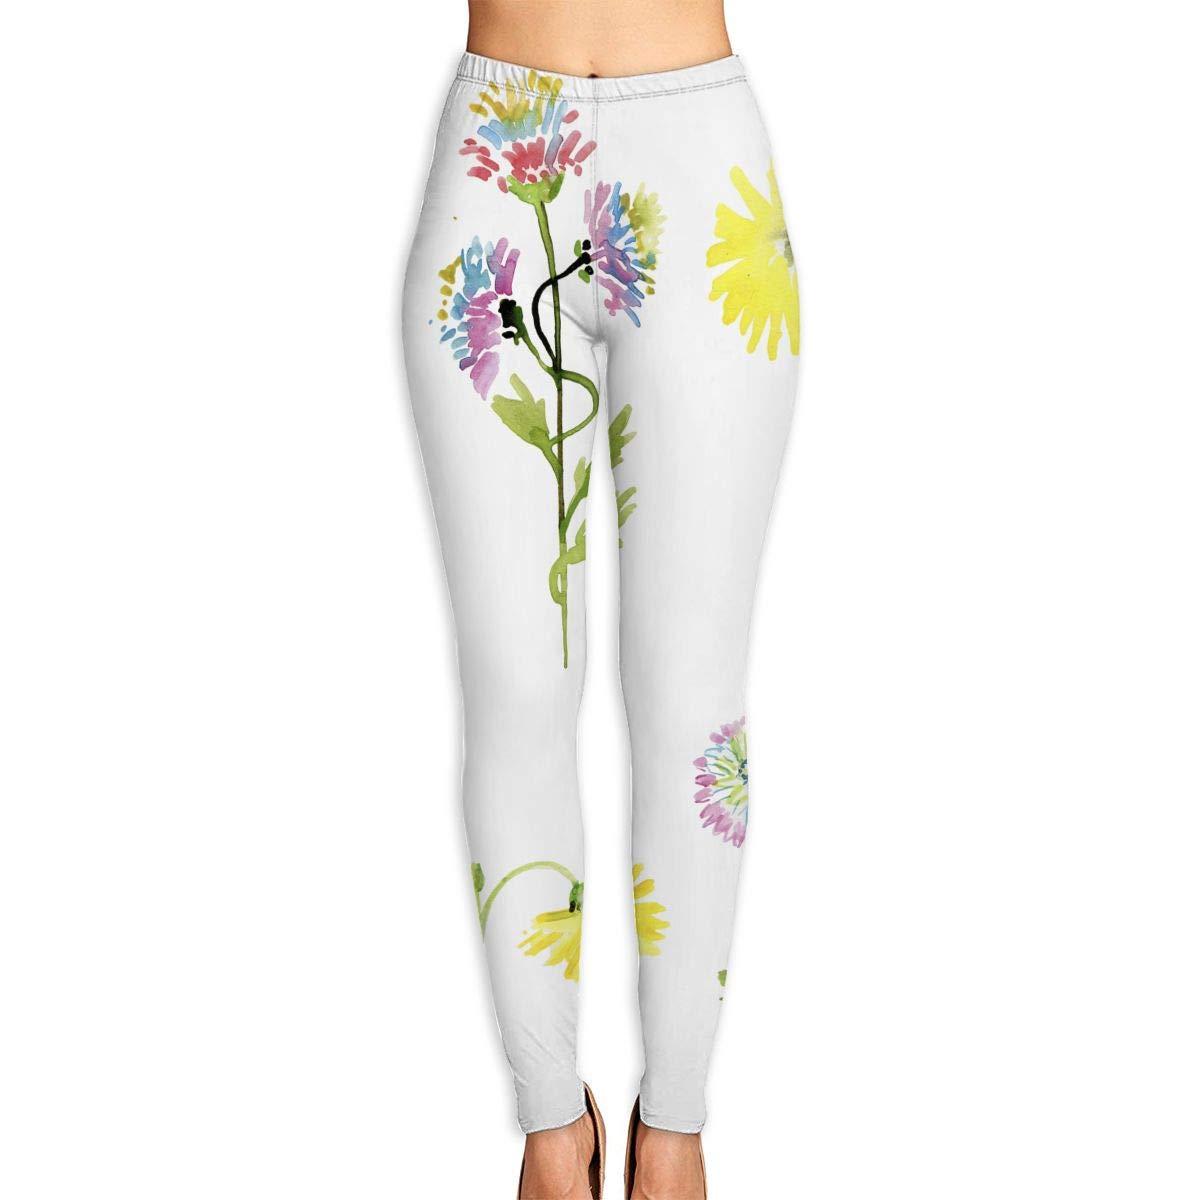 Amazon.com: Womens Yoga Pants Set Of Watercolor Drawing ...